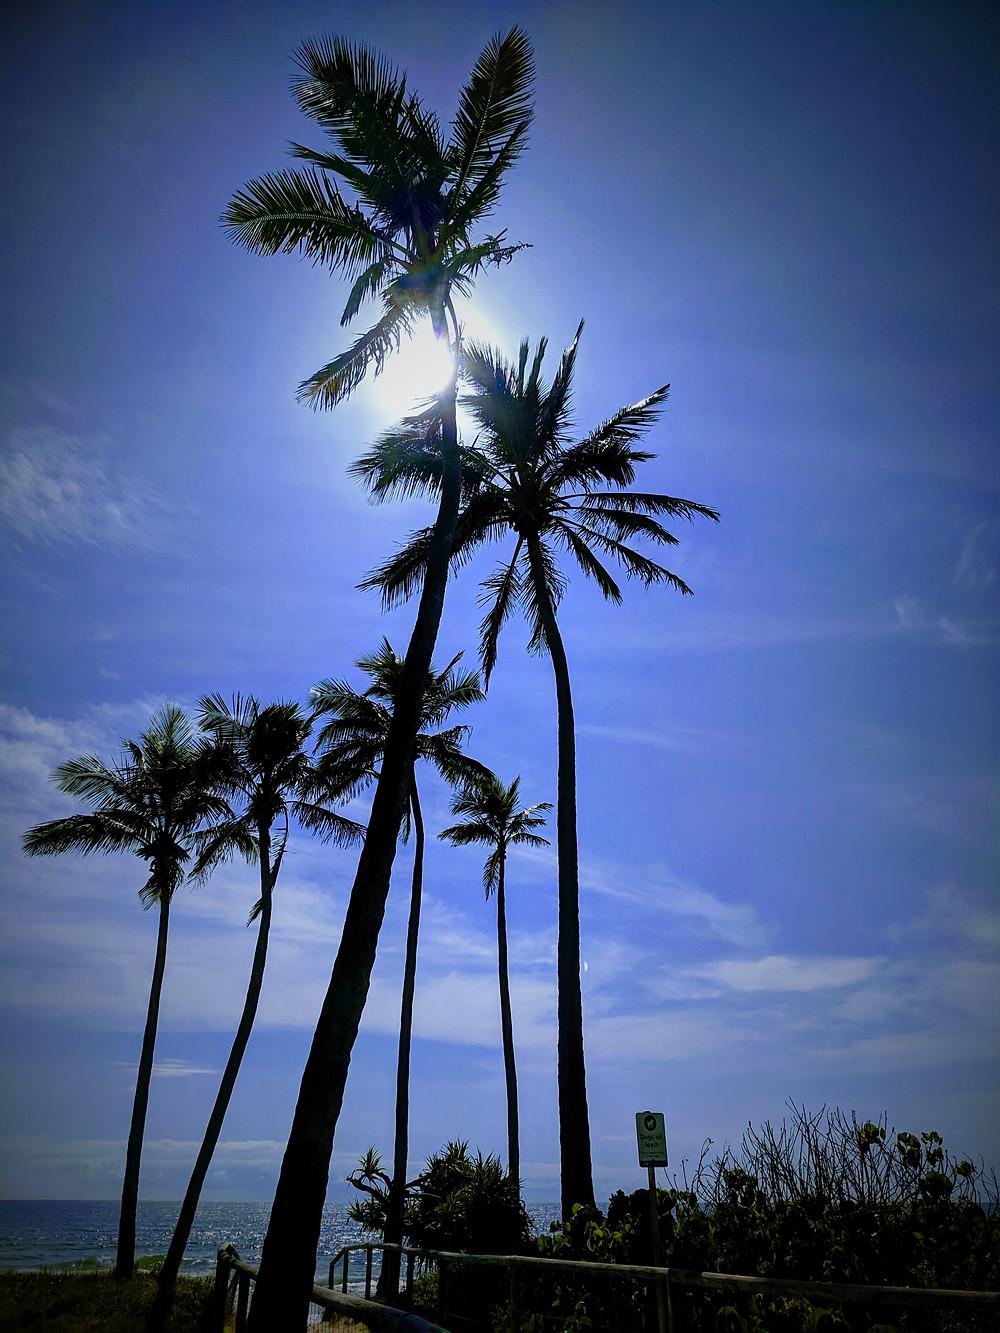 Palms at Sheraton Gold Coast © Copyright 2019 Bryan W Foster